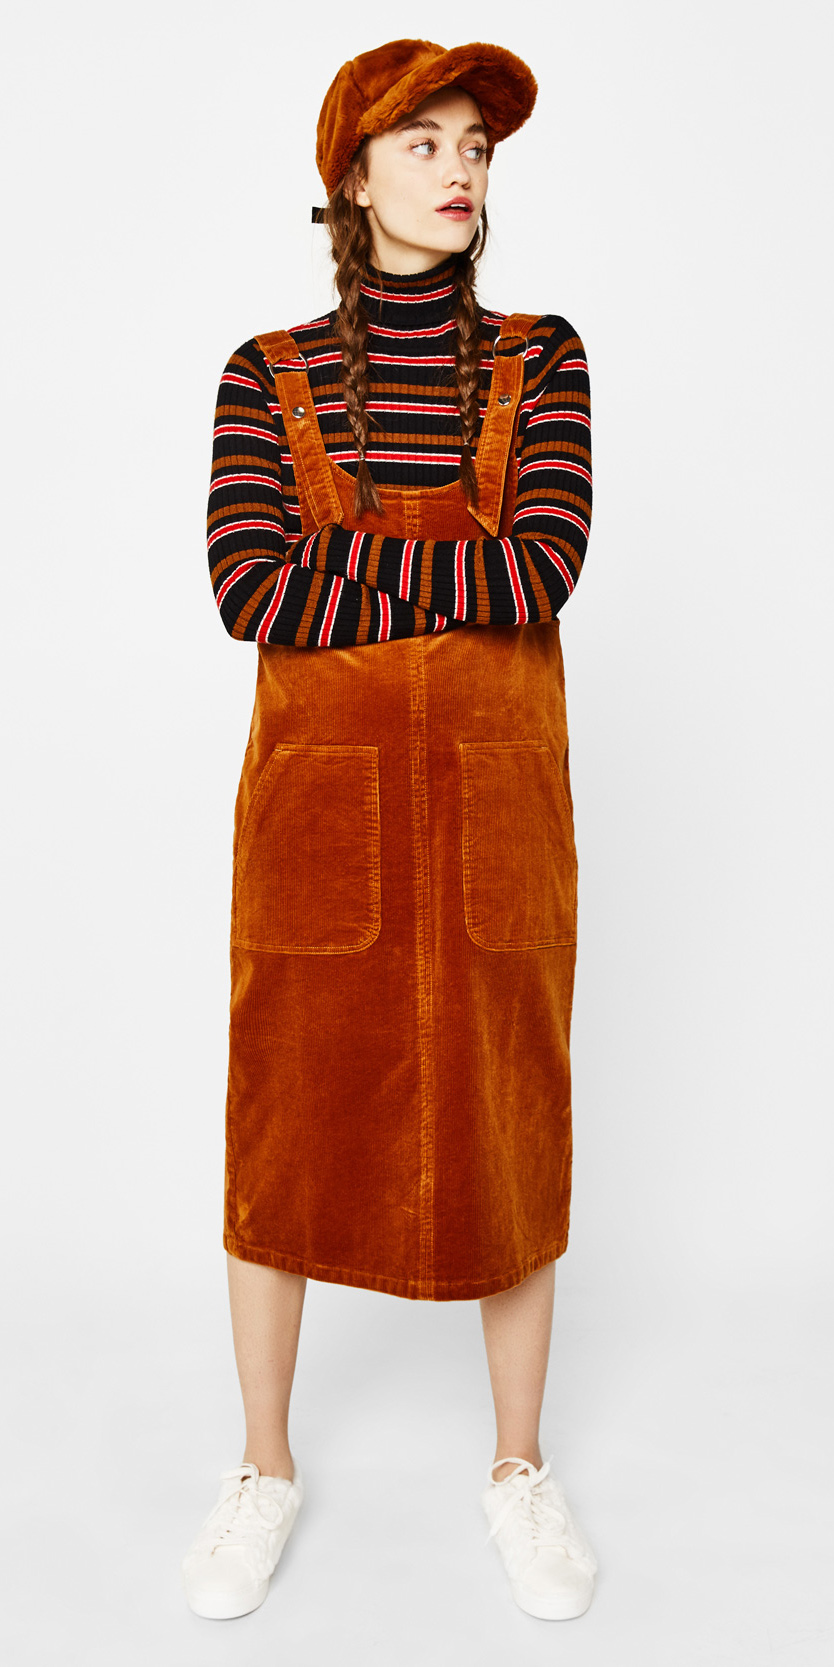 orange-dress-jumper-black-top-turtleneck-stripe-hat-braids-hairr-white-shoe-sneakers-layer-corduroy-fall-winter-weekend.jpg